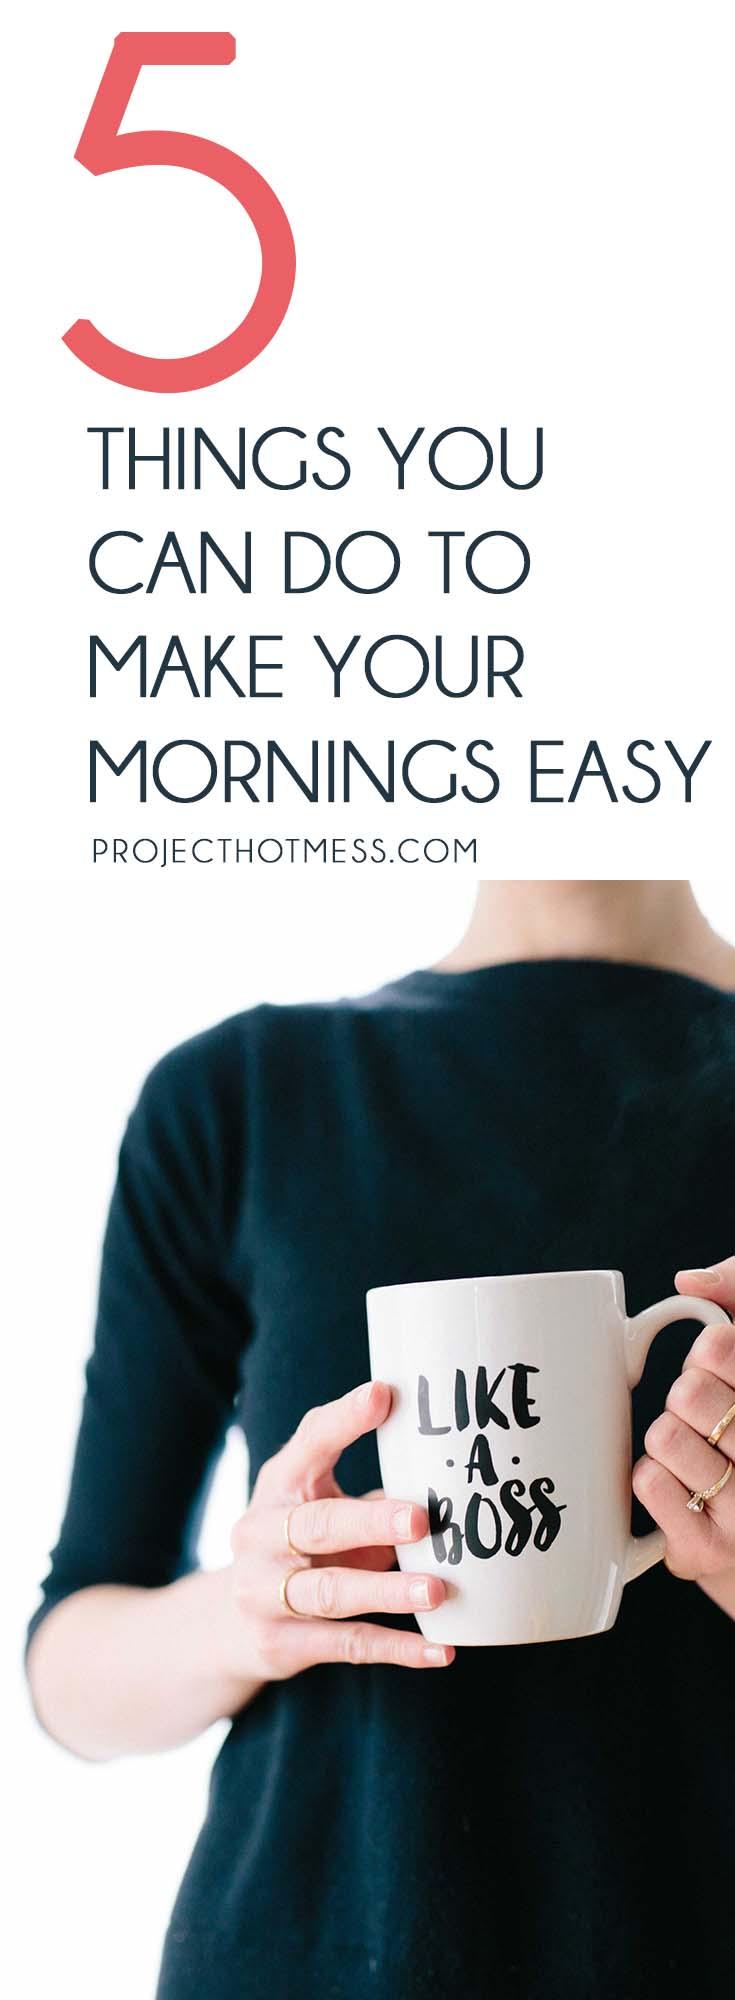 how to make mugen easier